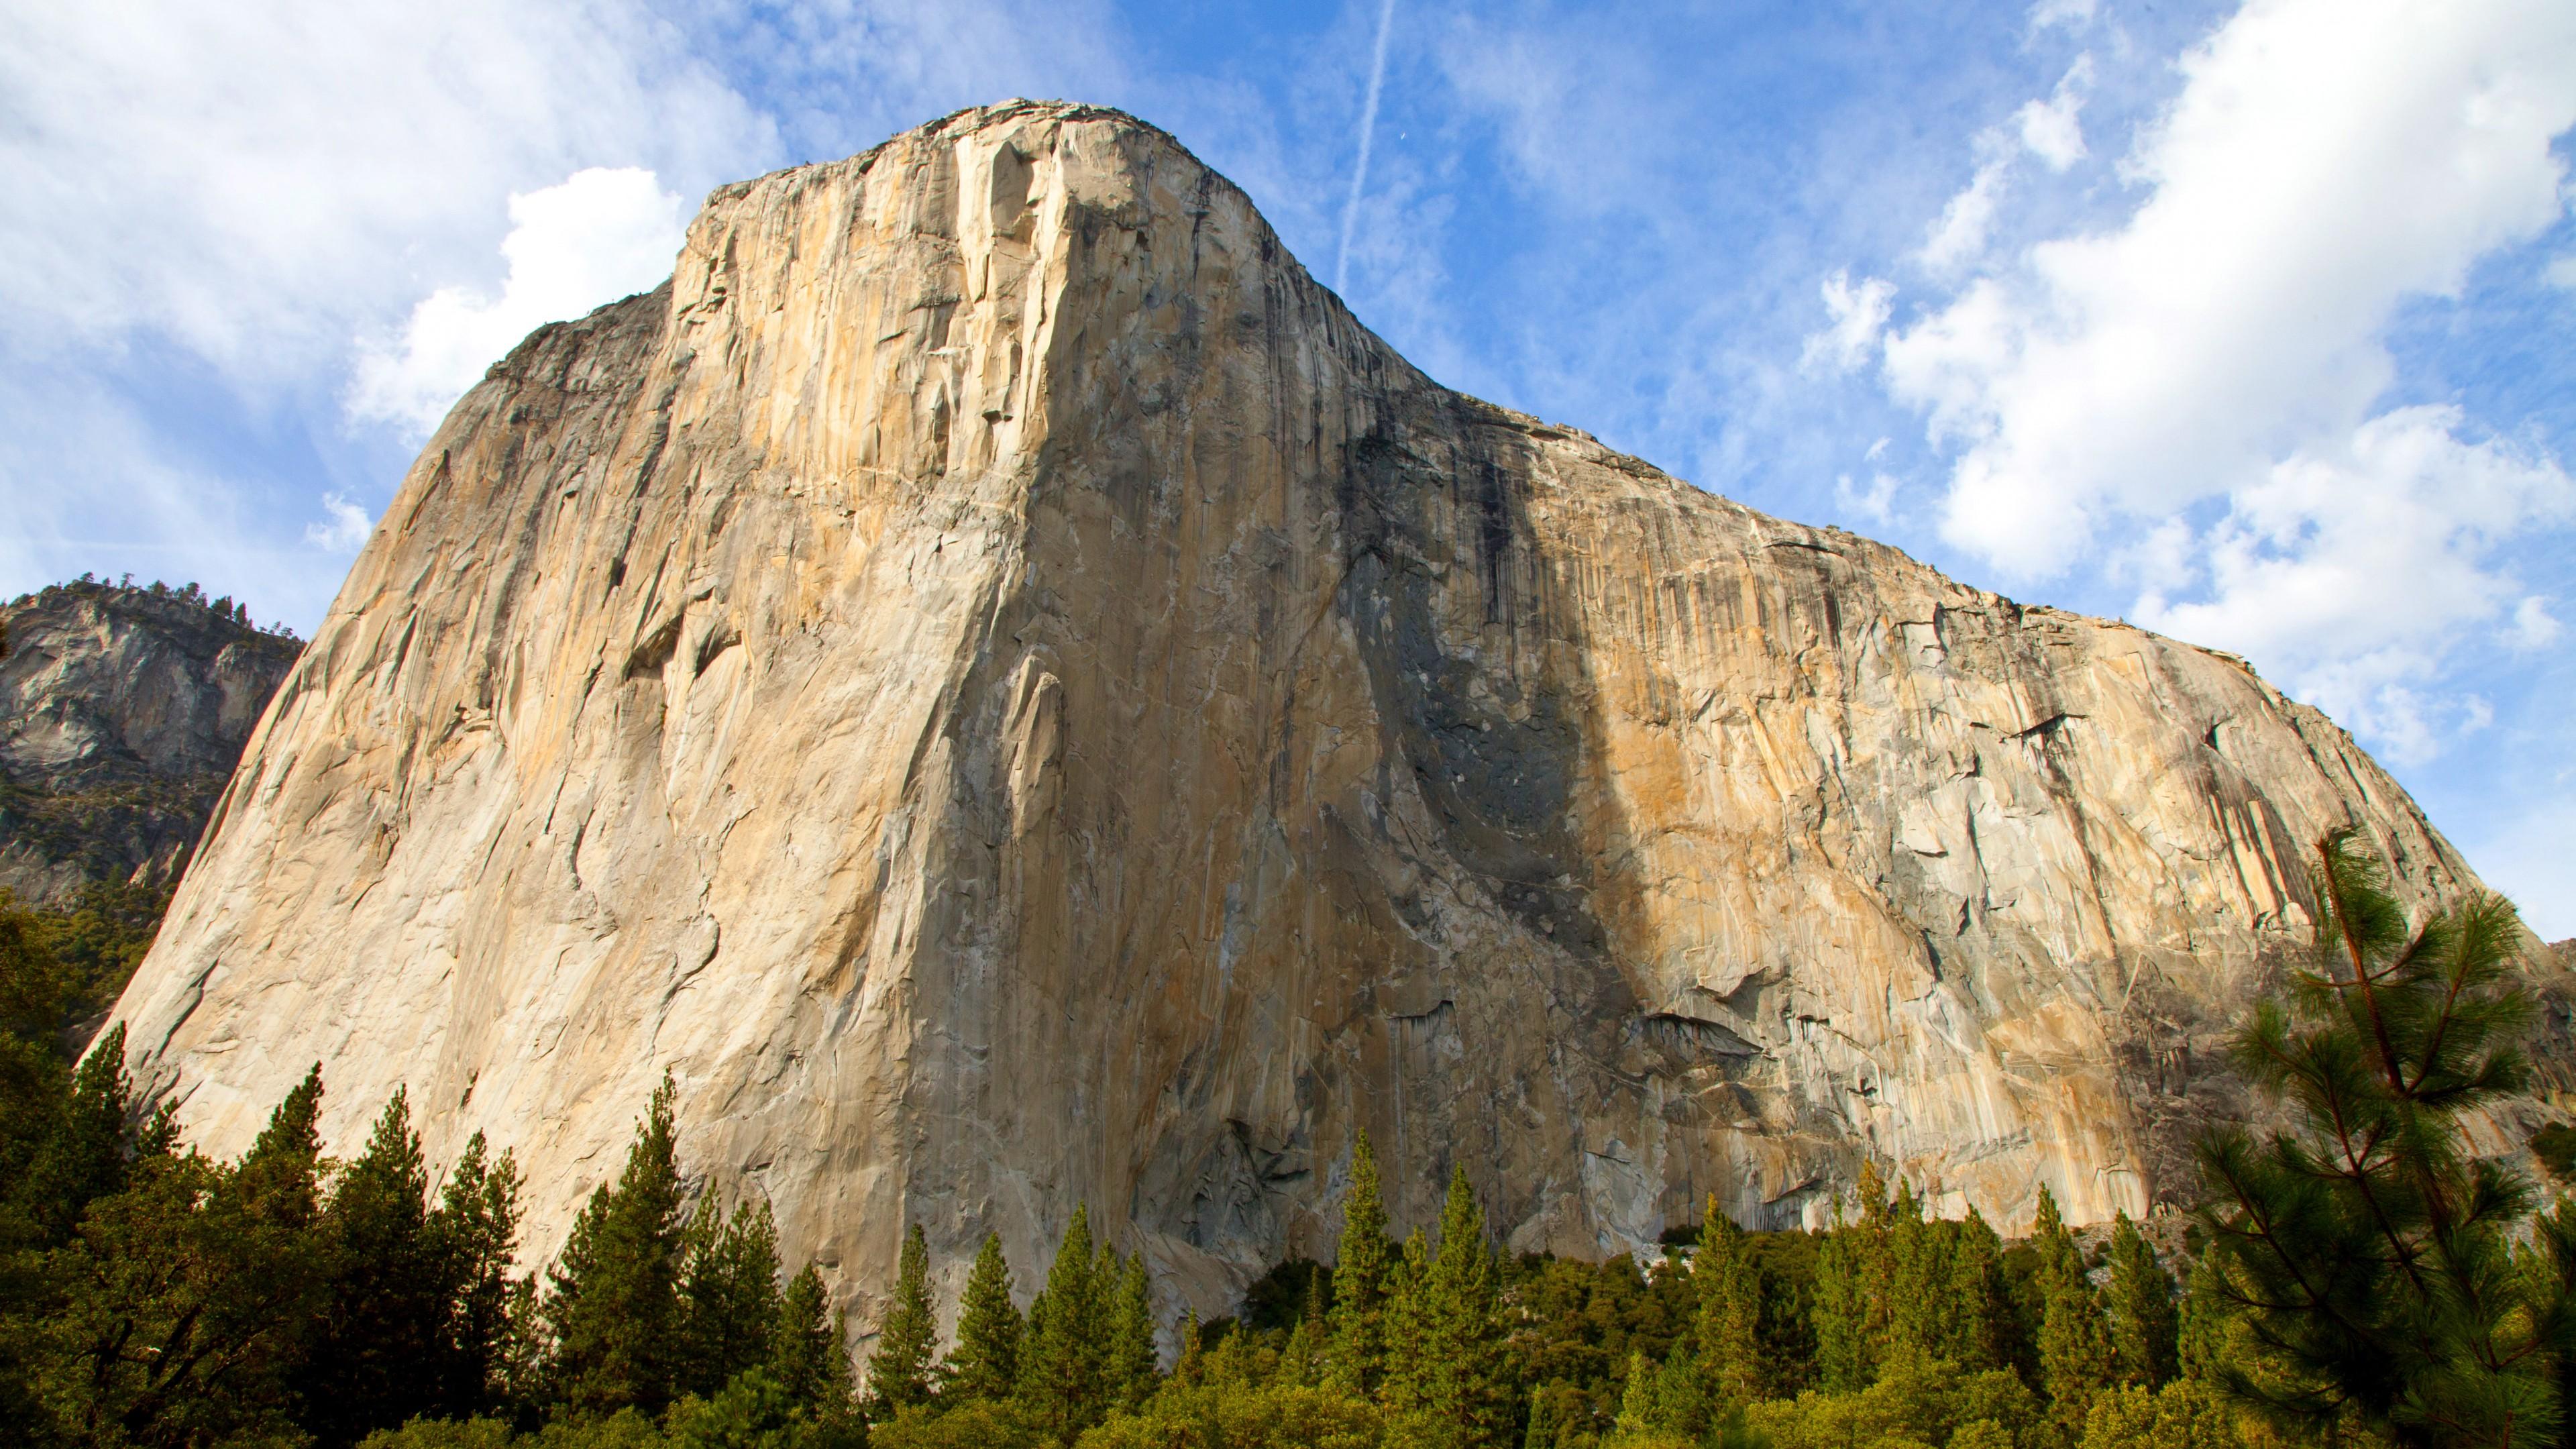 Wallpaper El Capitan 5k 4k Wallpaper Yosemite Hd Forest